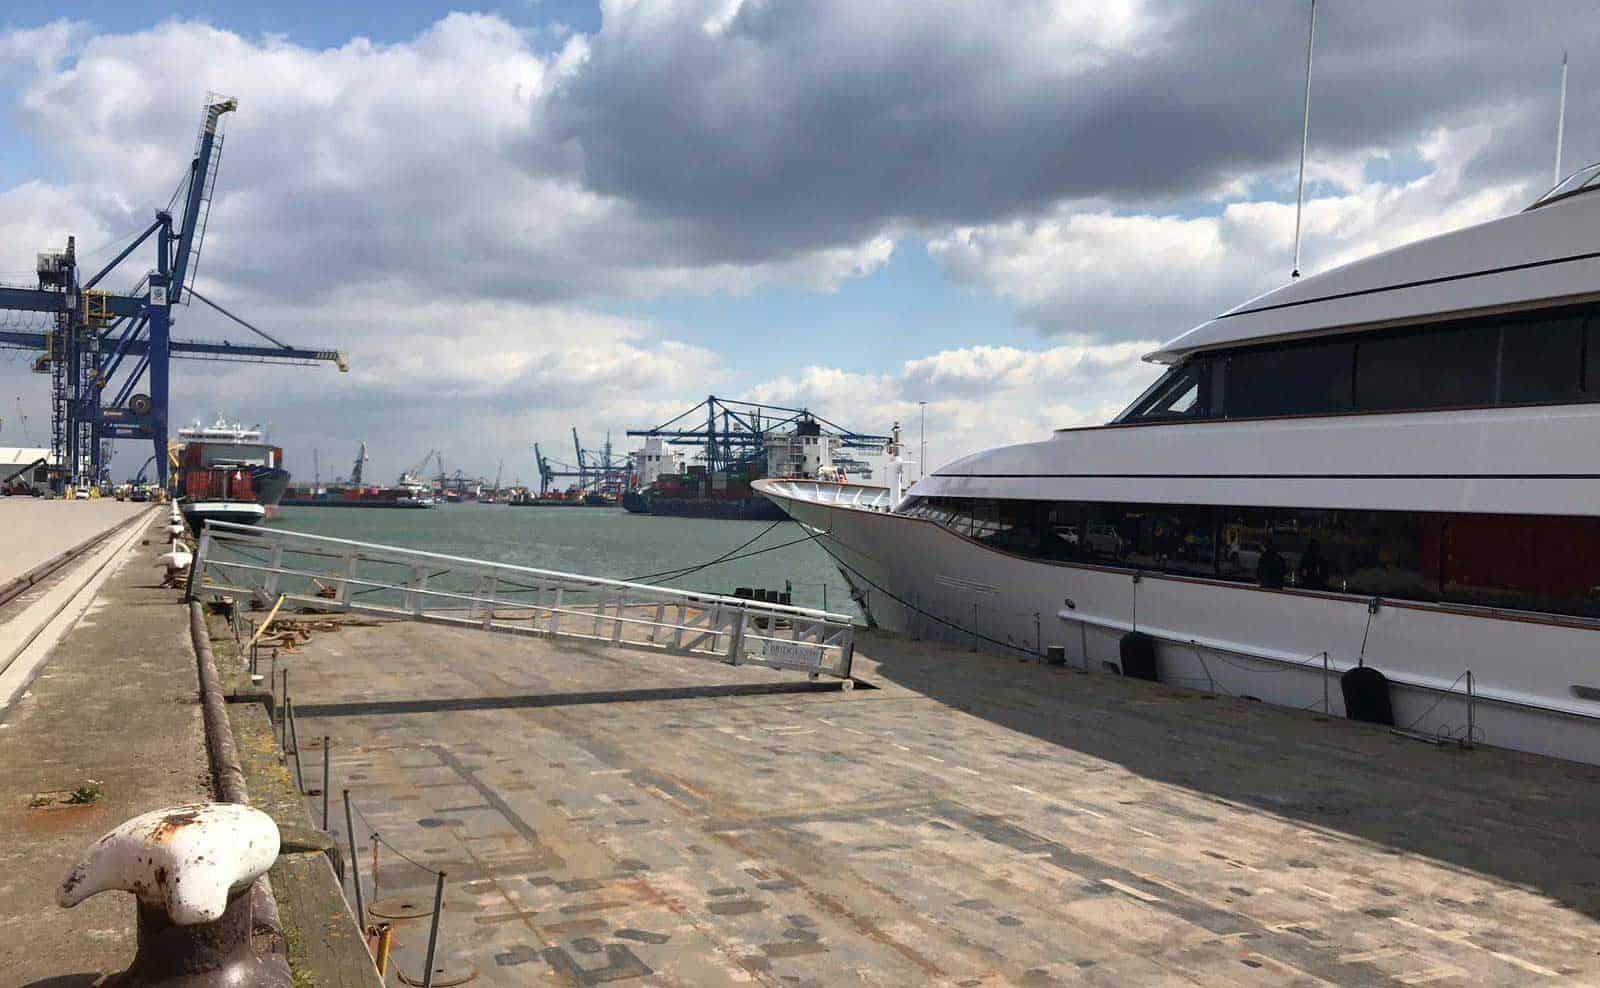 BRIDGES2000 Access to Luxury Yacht 3